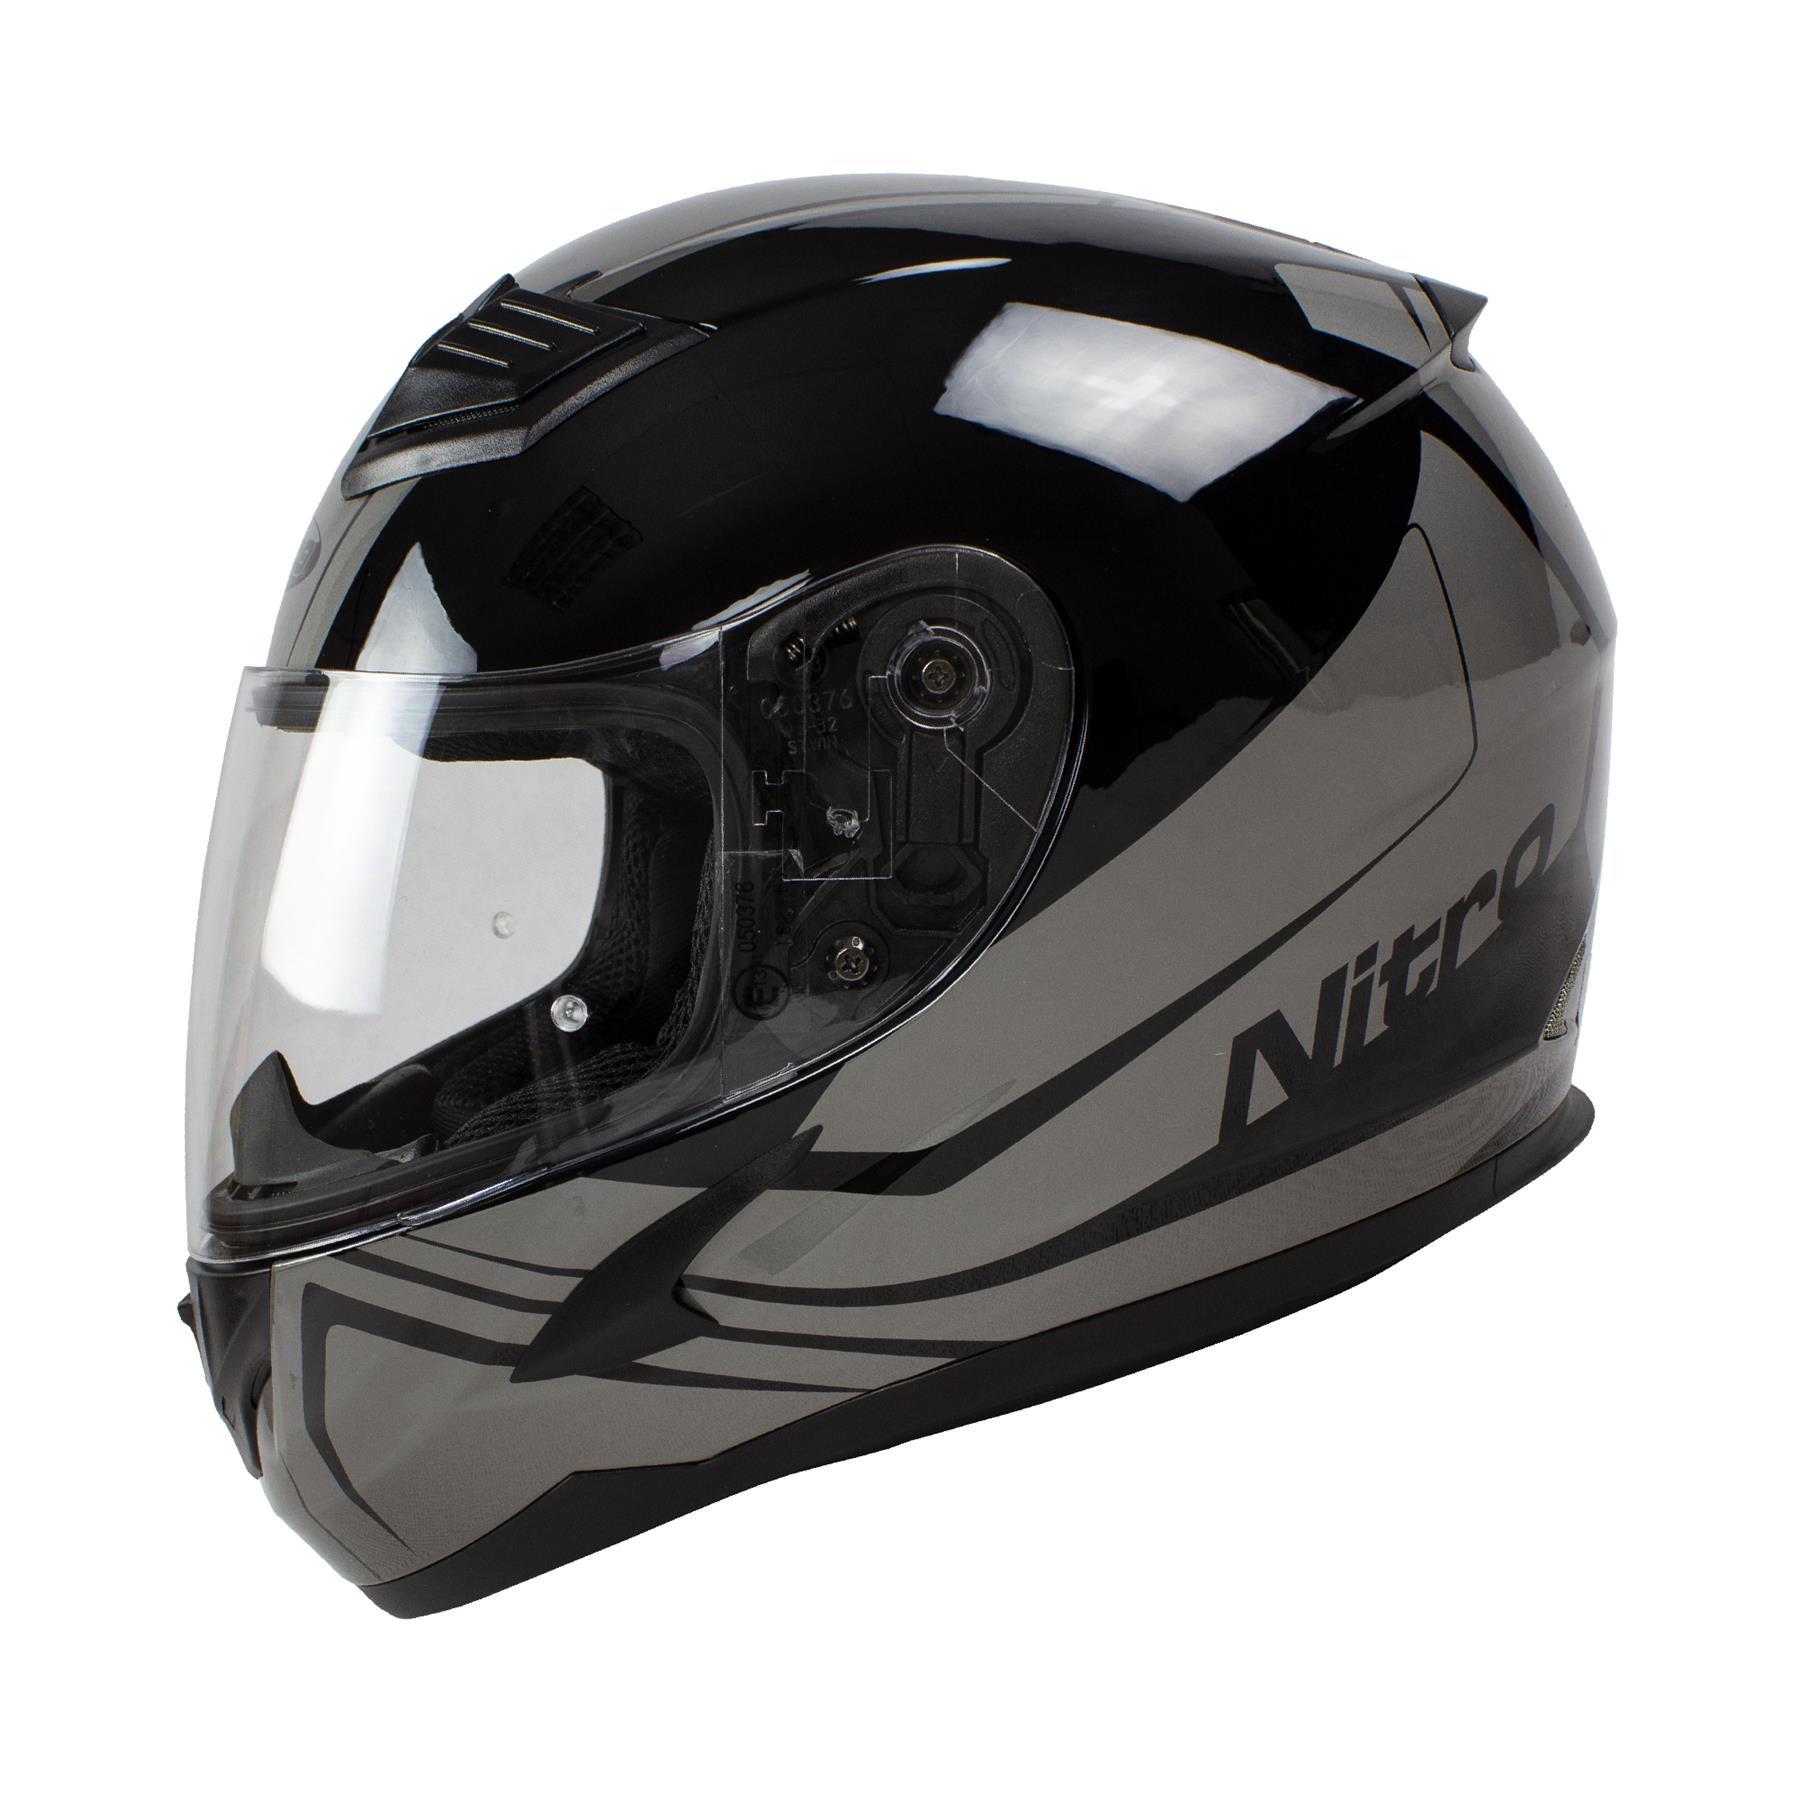 Nitro-N2400-Rogue-Full-Face-Motorcycle-Motorbike-Crash-Helmet-Black-Blue-Red thumbnail 19